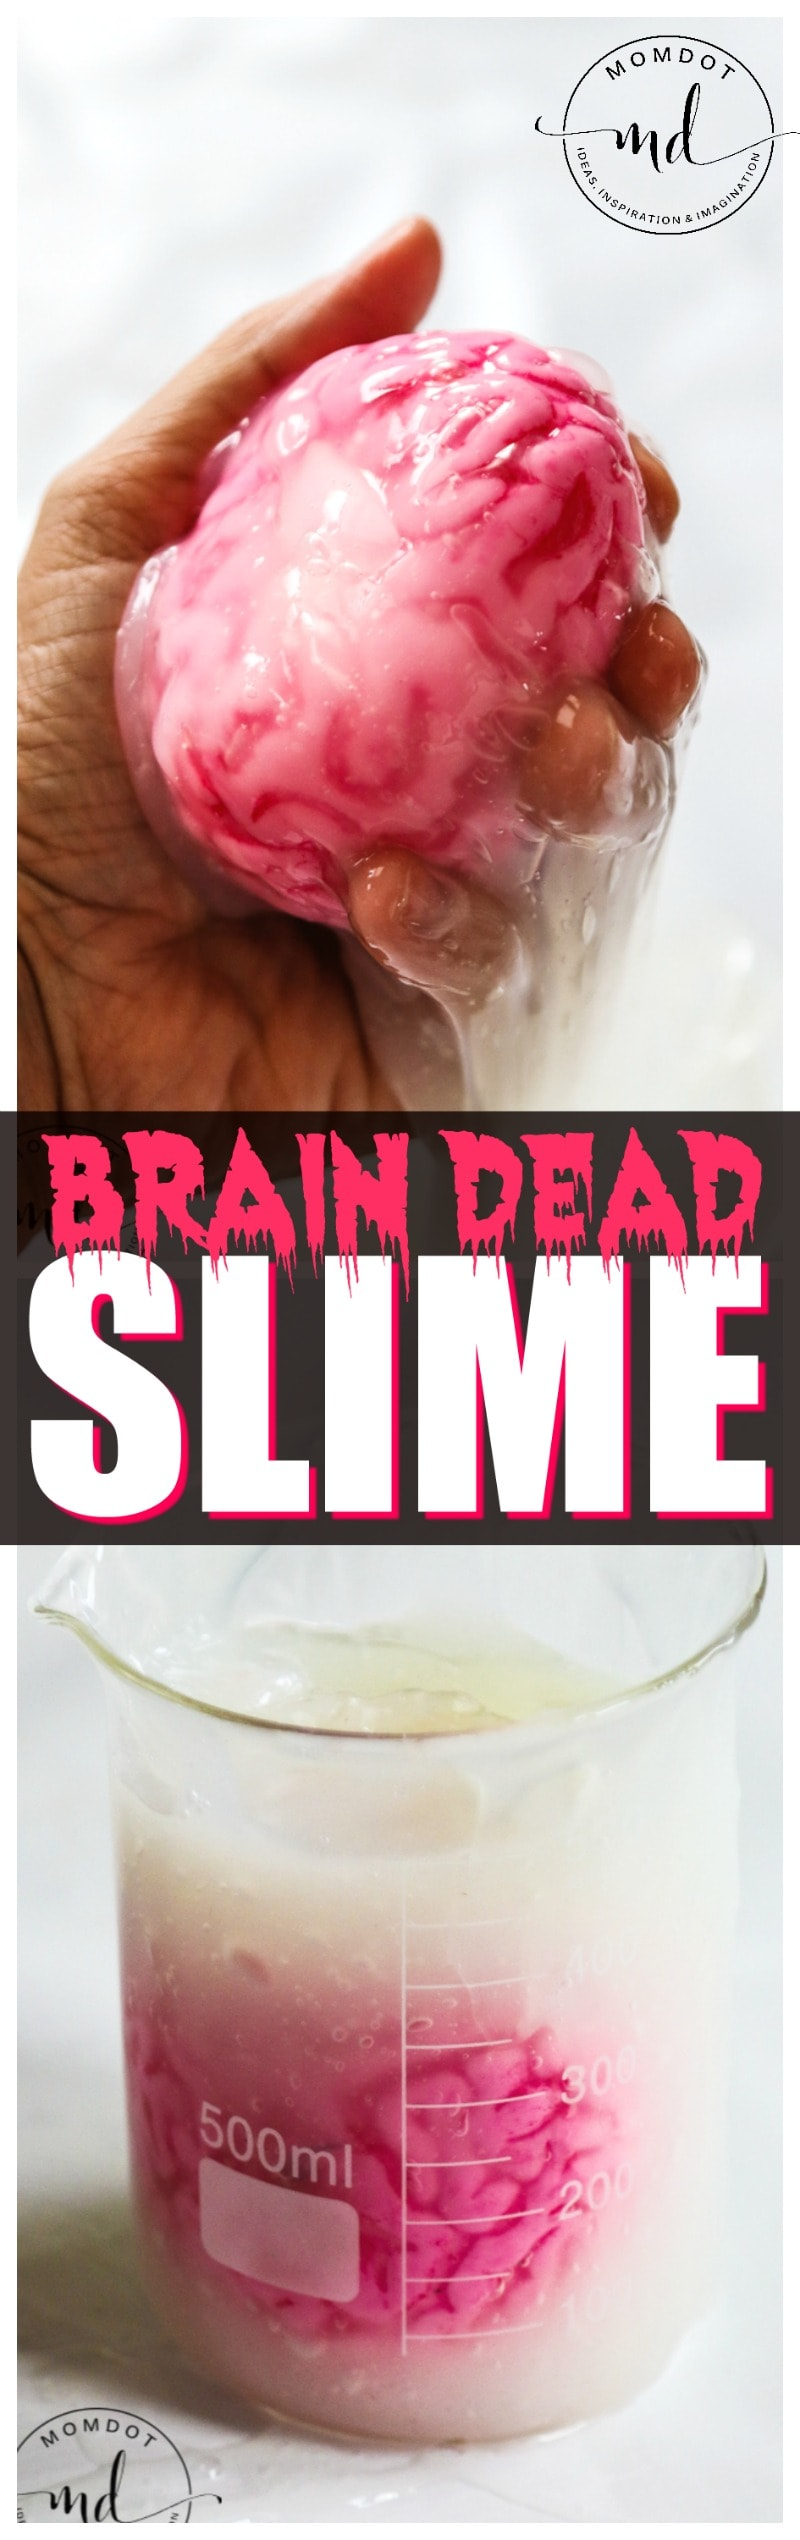 Brain Dead Slime : How to make FREAKY Halloween Slime | Halloween Decor